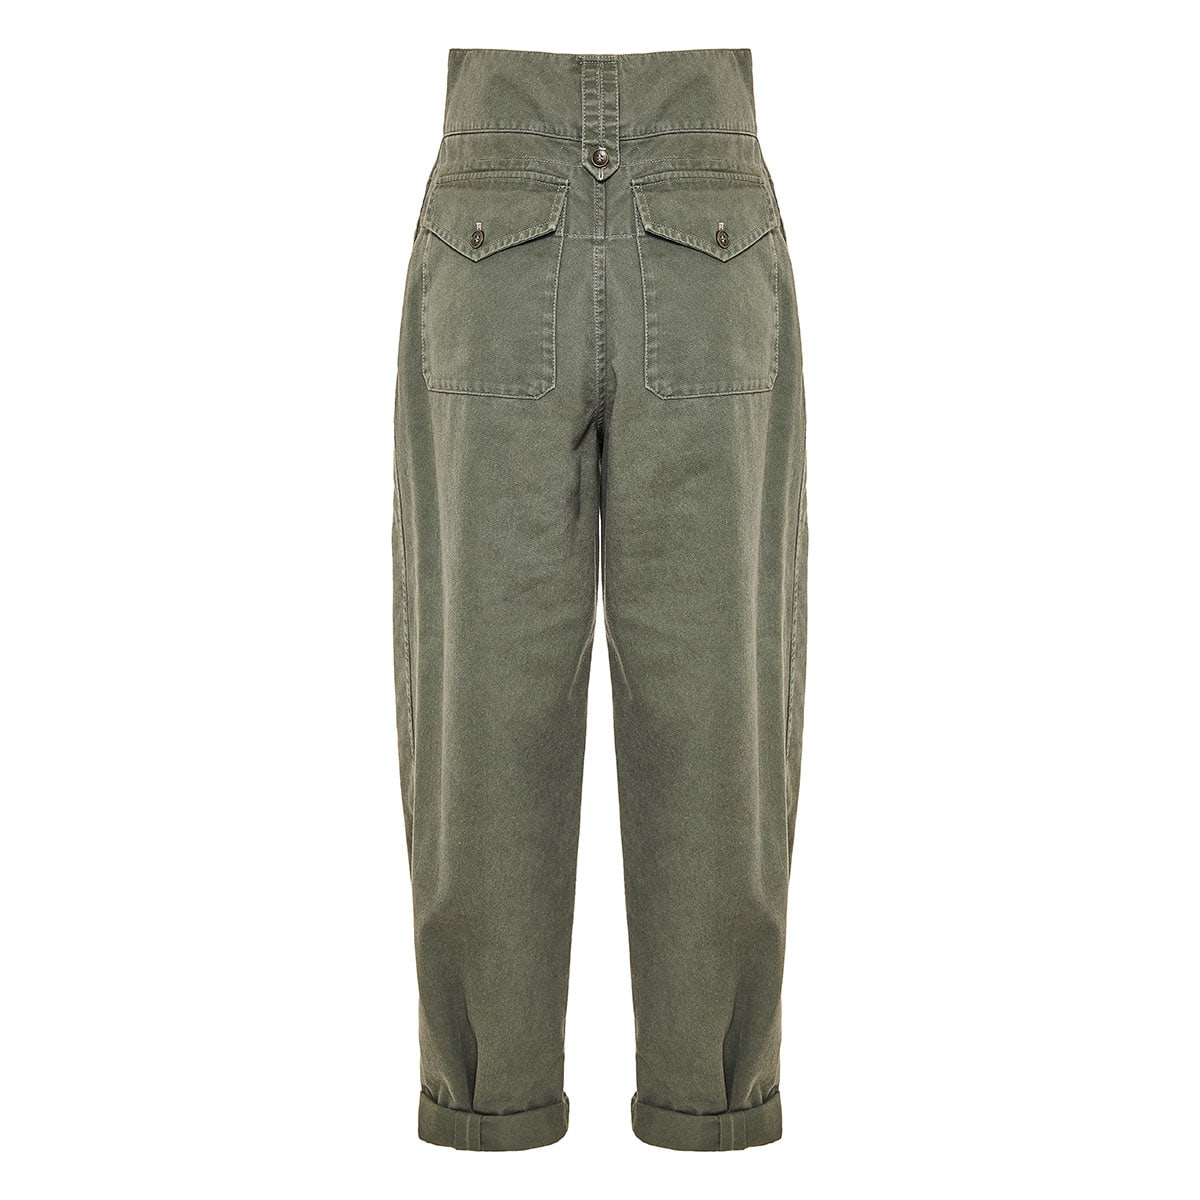 High-waist gabardine cargo trousers